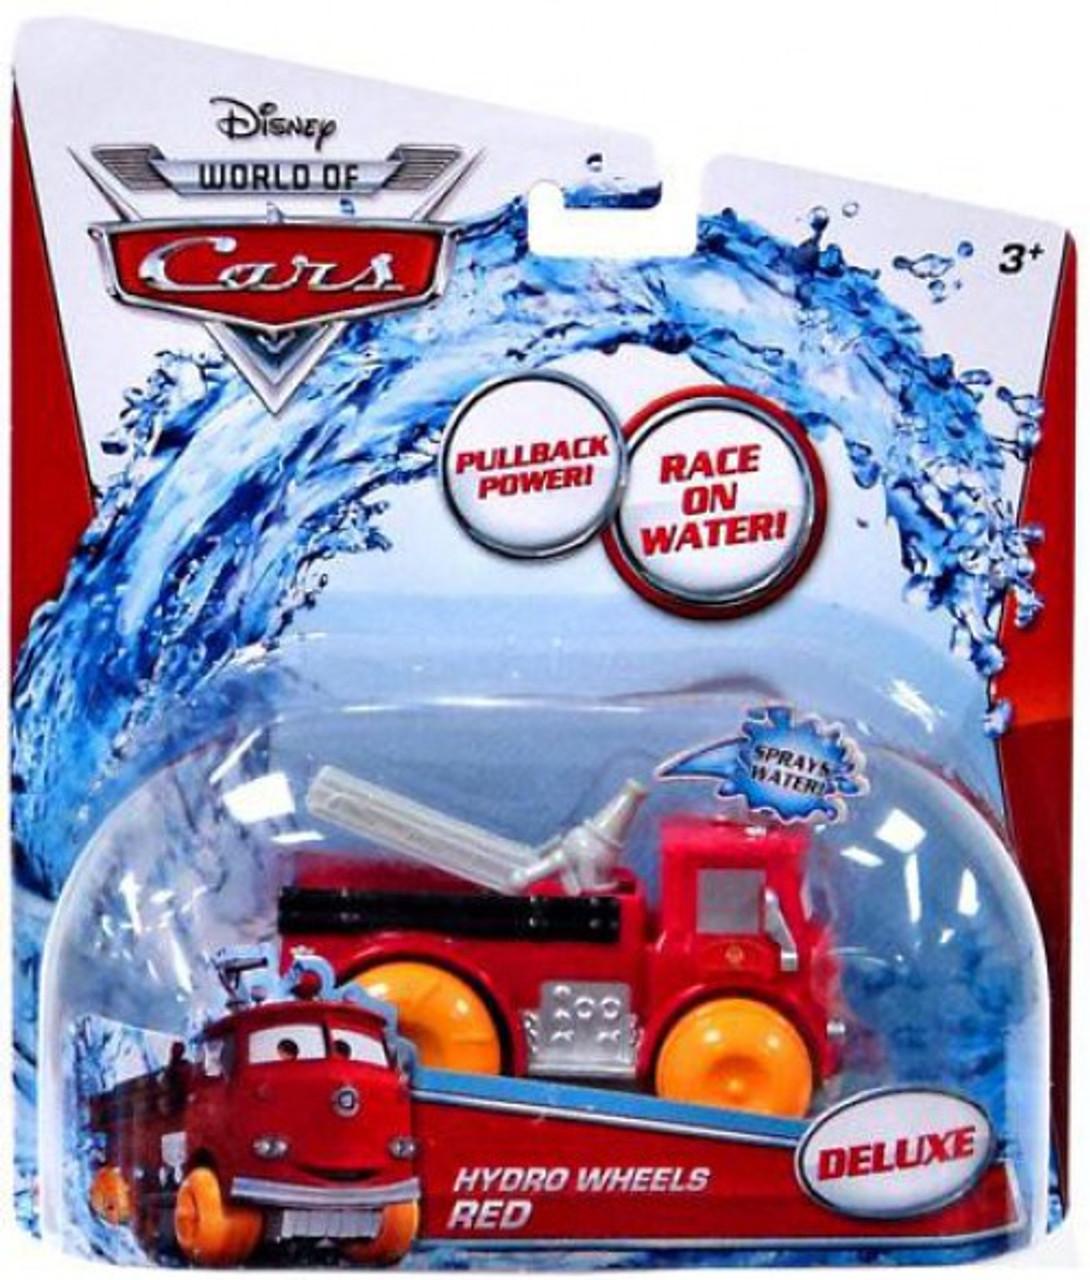 Disney Cars The World of Cars Hydro Wheels Red Plastic Car